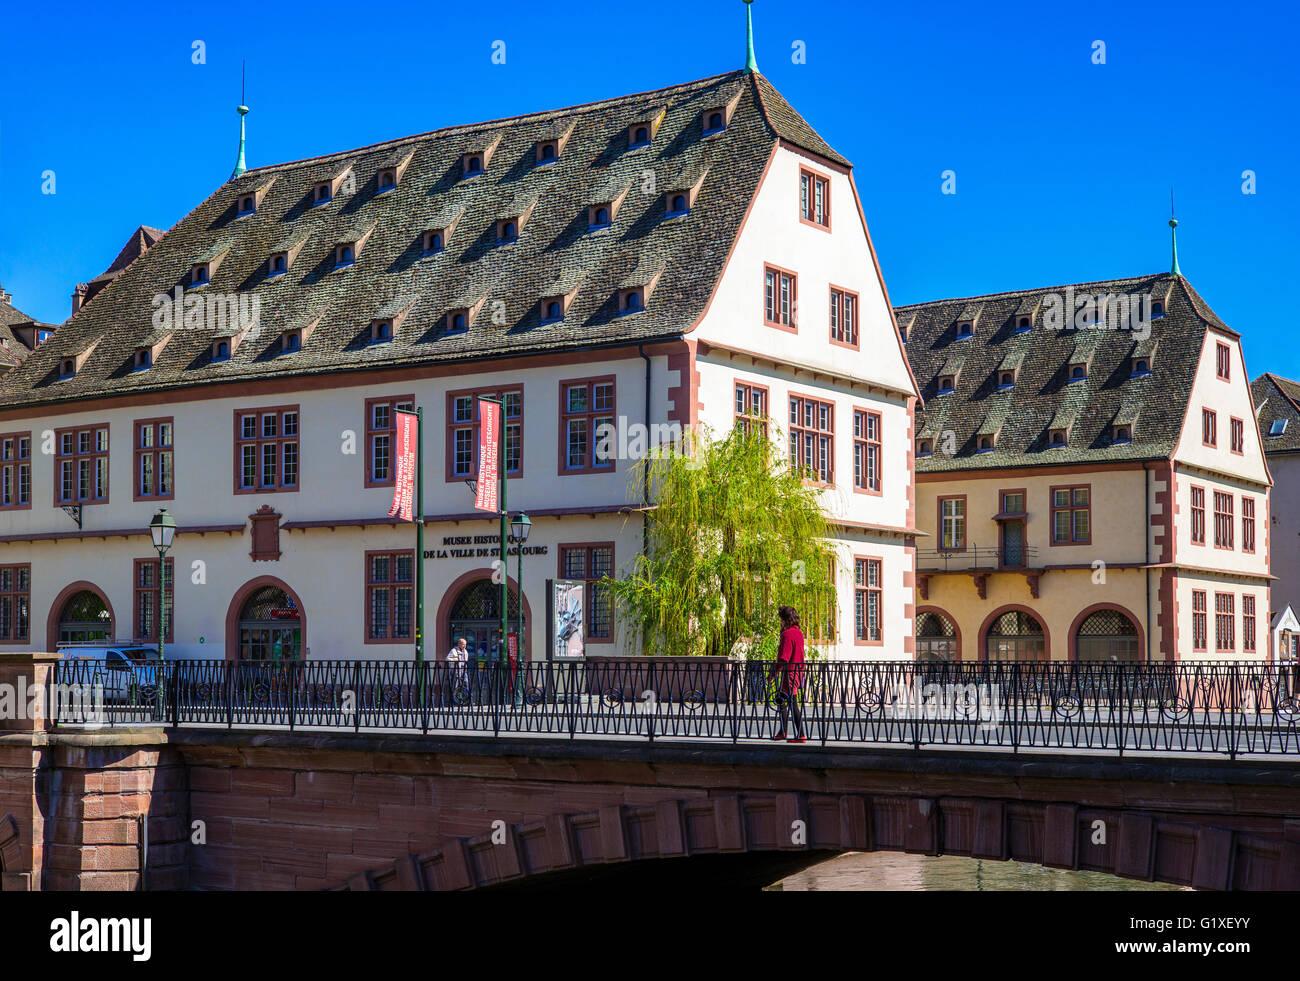 'La Grande Boucherie' building 16th century, historical museum, Strasbourg, Alsace, France - Stock Image